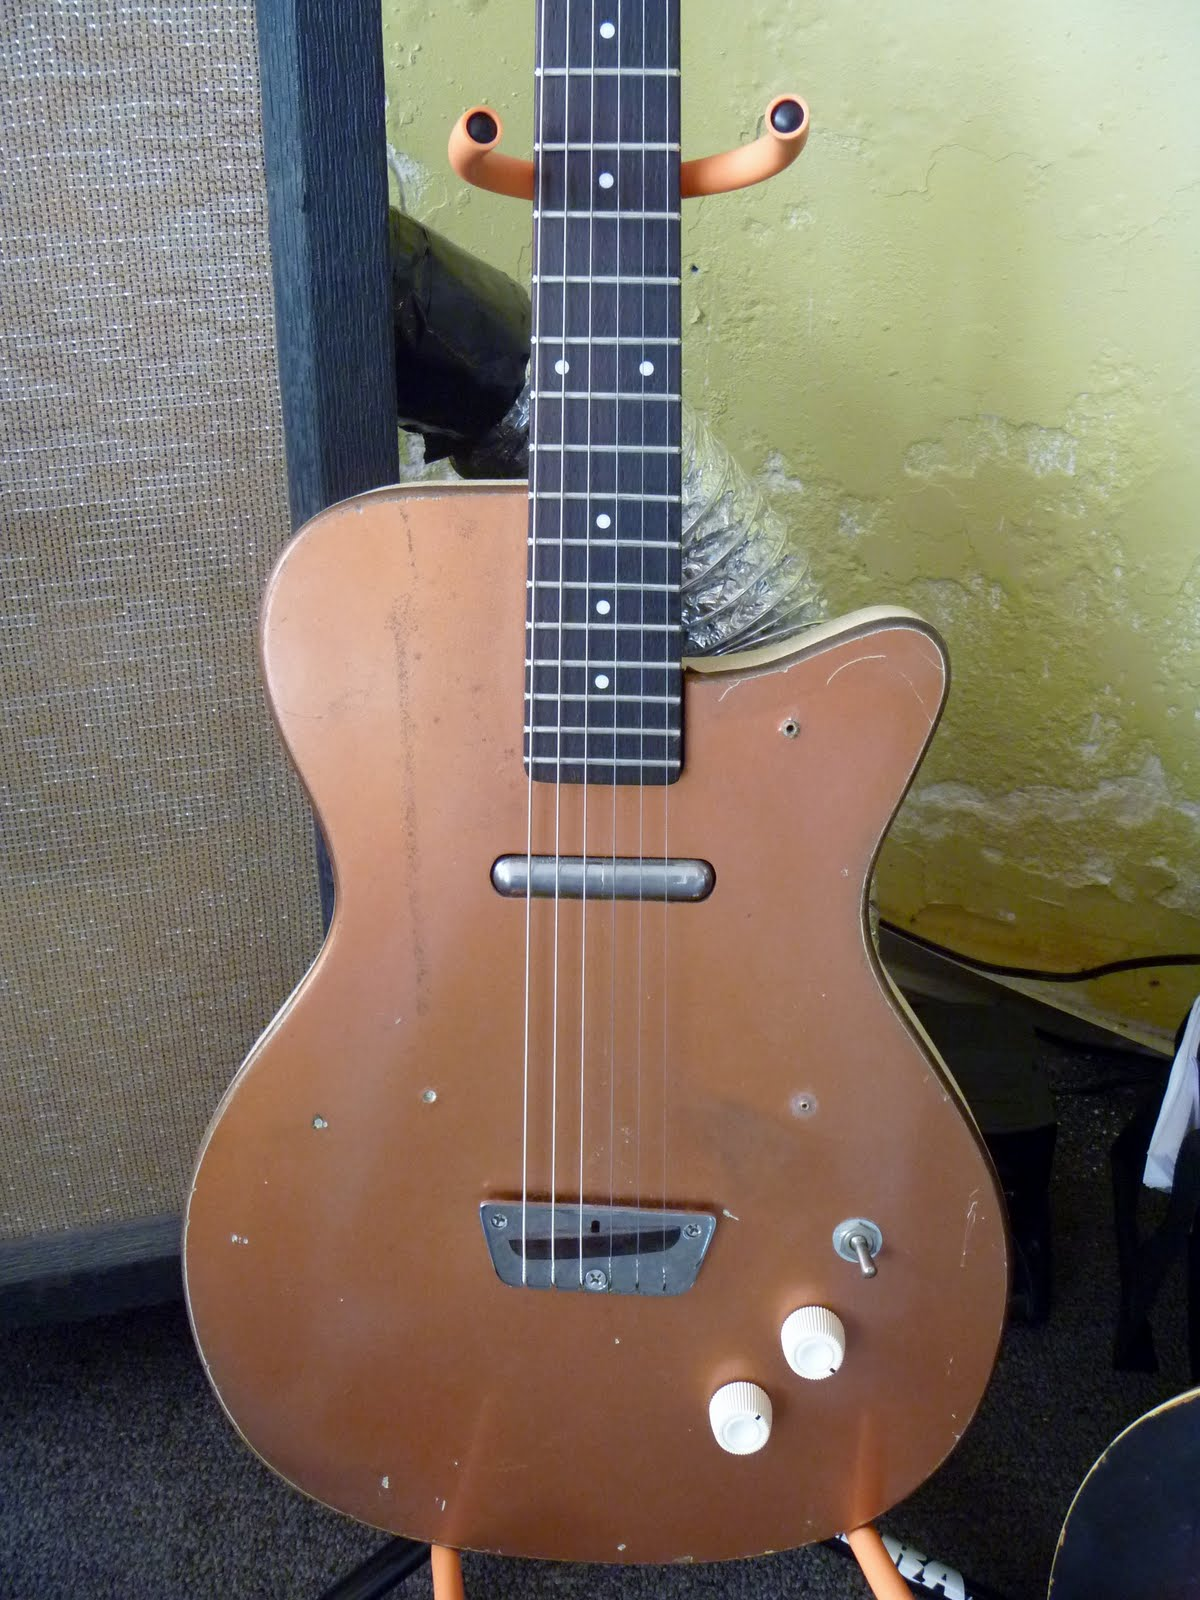 wood wire guitar shop blog silvertone 1415 rh woodandwireguitarshop com Sears and Roebuck Guitars Silver Tone Silver Tone Guitar Serial Numbers